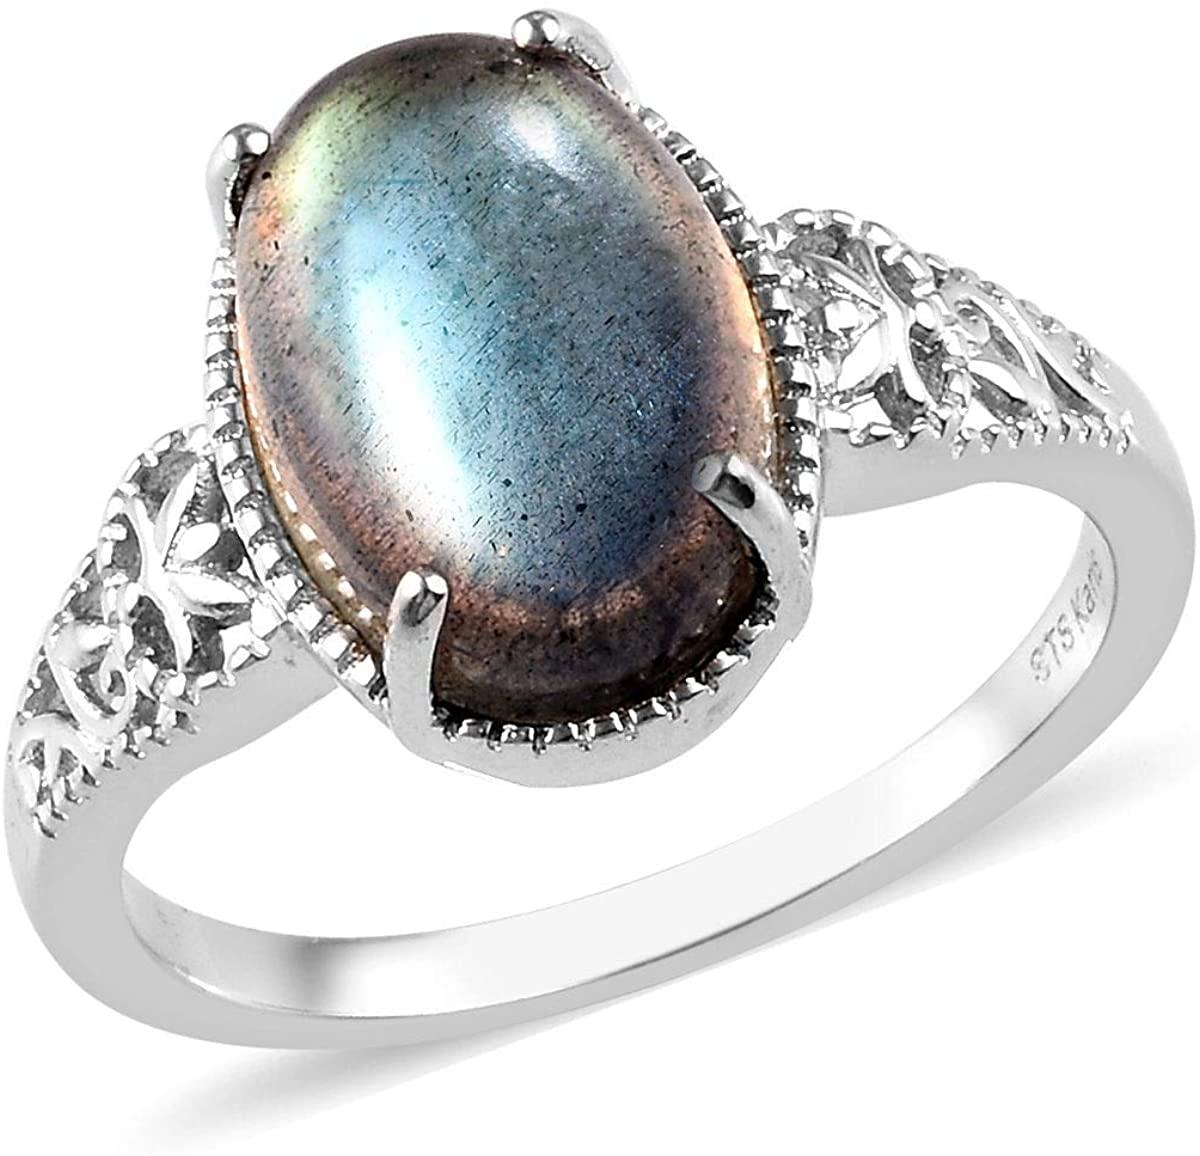 Shop LC Delivering Joy Karis Platinum Plated Oval Labradorite Solitaire Ring Costume Unique Fashion Jewelry for Women Size 9